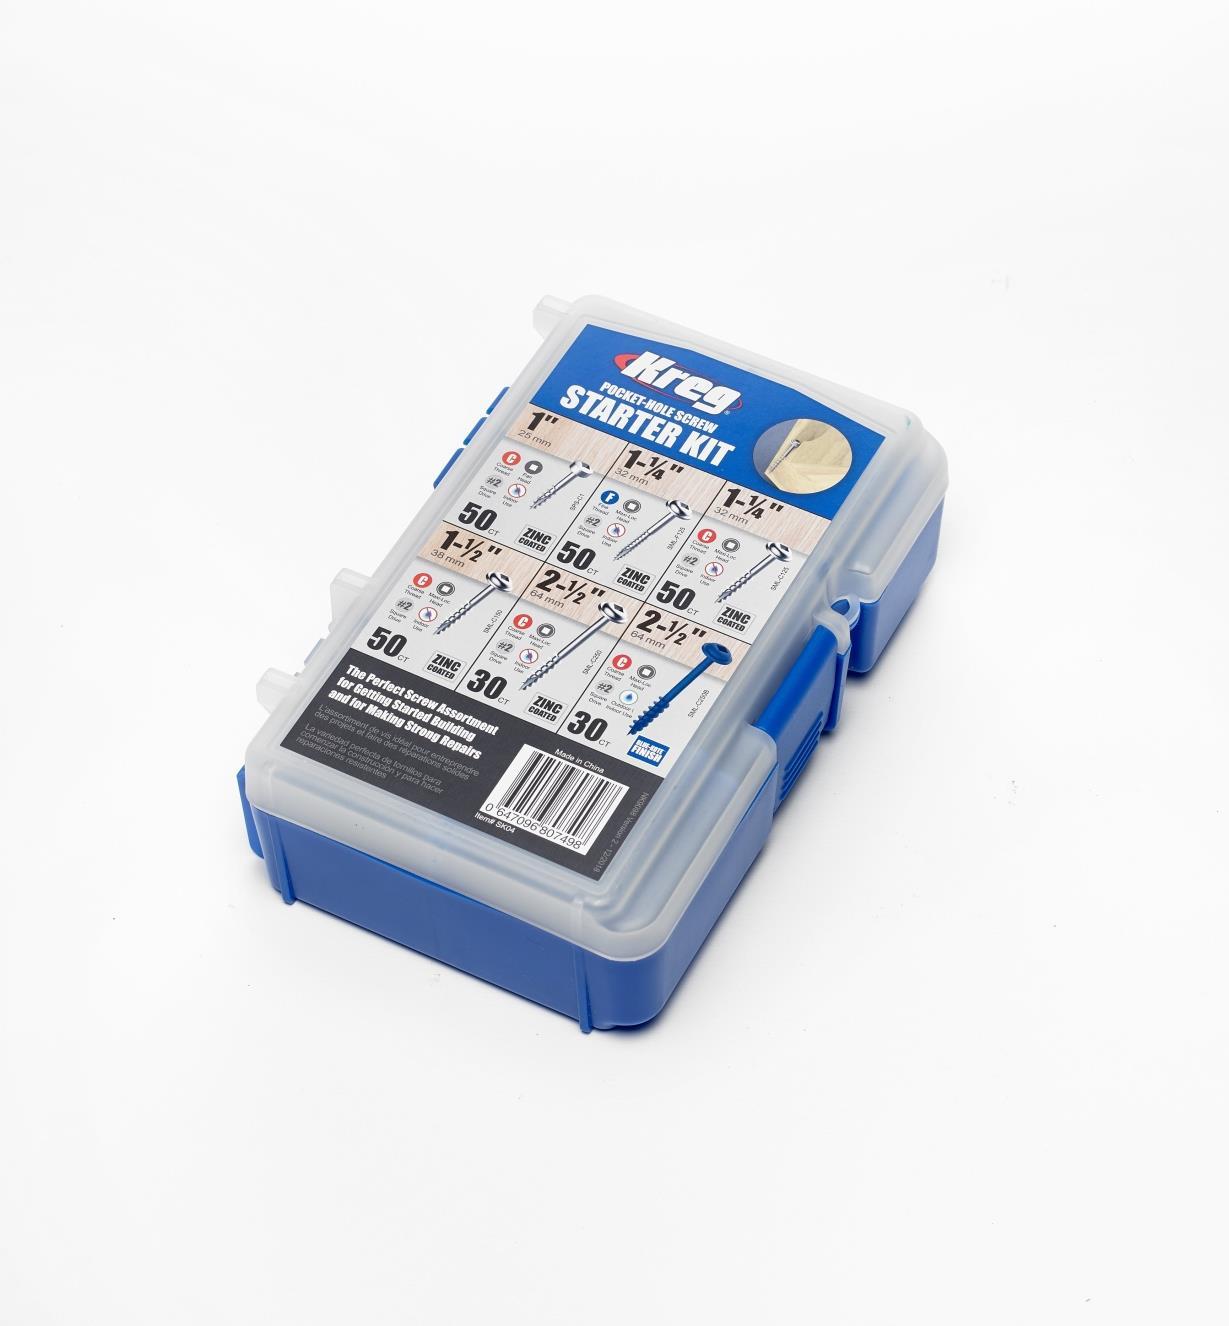 25K6058 - Kreg Pocket-Hole Screw Starter Kit, 260 pcs